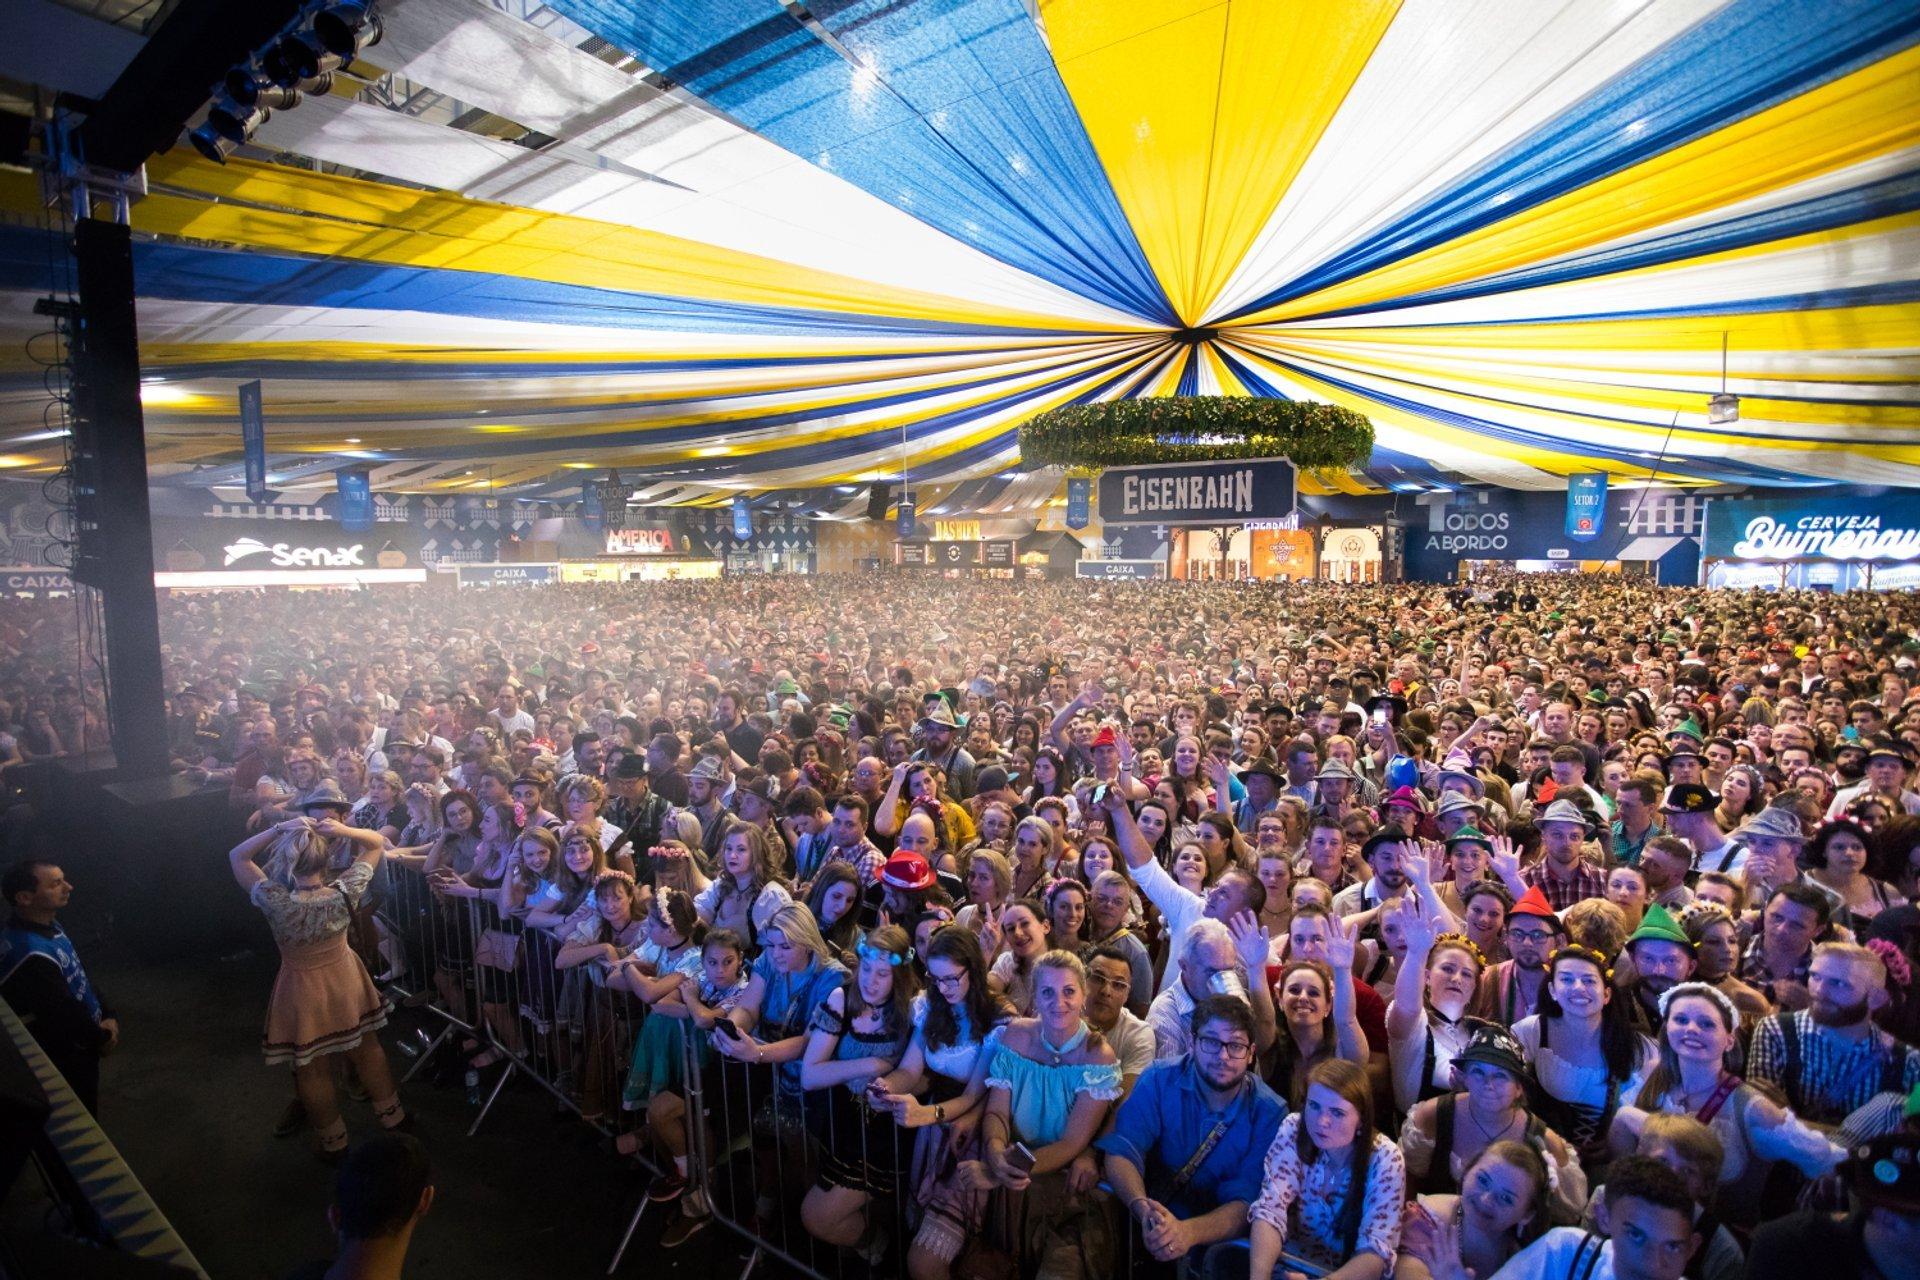 Best time to see Oktoberfest Blumenau in Brazil 2020